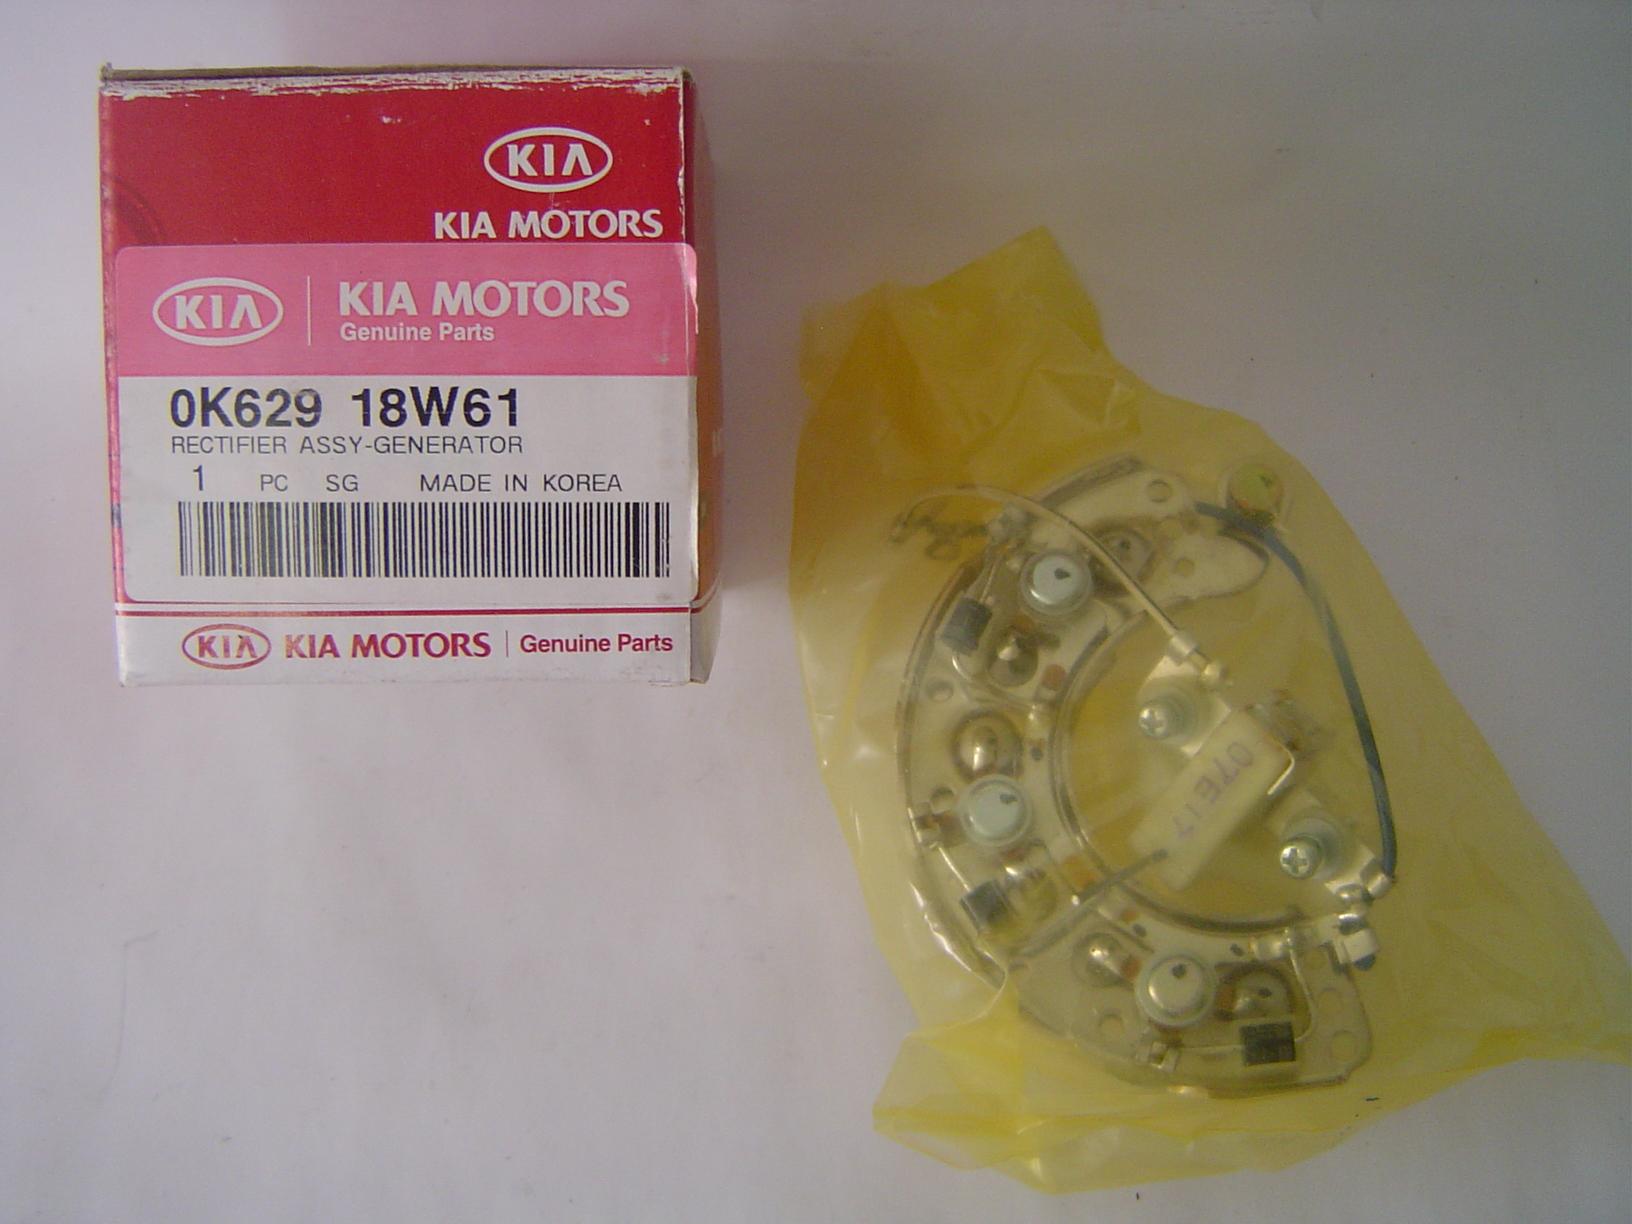 PONTE RETIFICADORA DO ALTERNADOR KIA K3600 / KIA BESTA 2.7 Código 0K62918W61